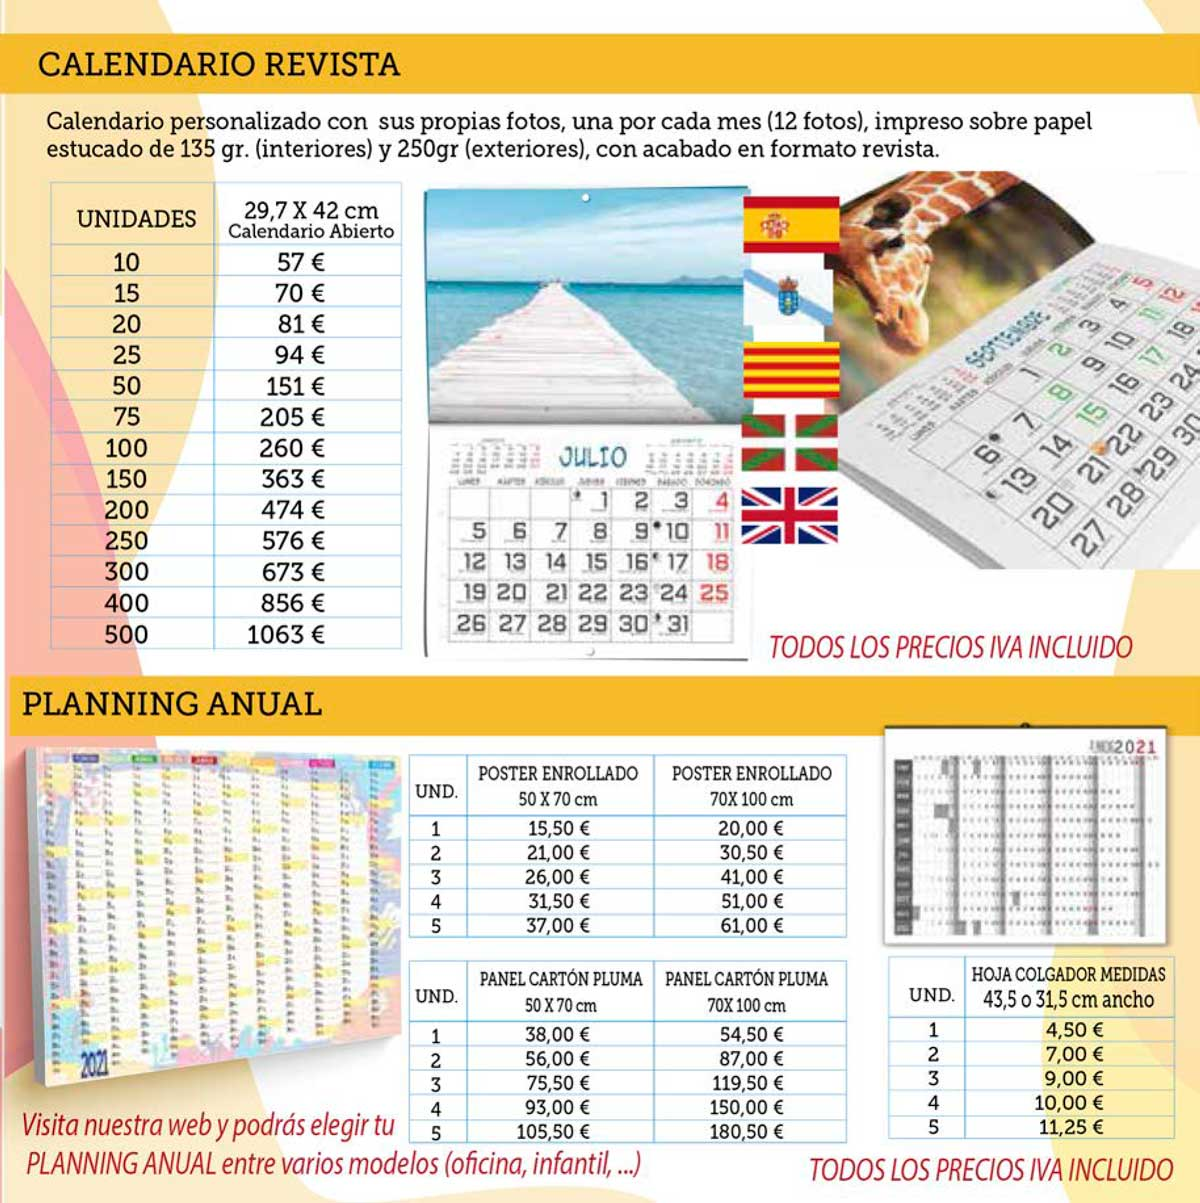 calendario revista personalizado printermania